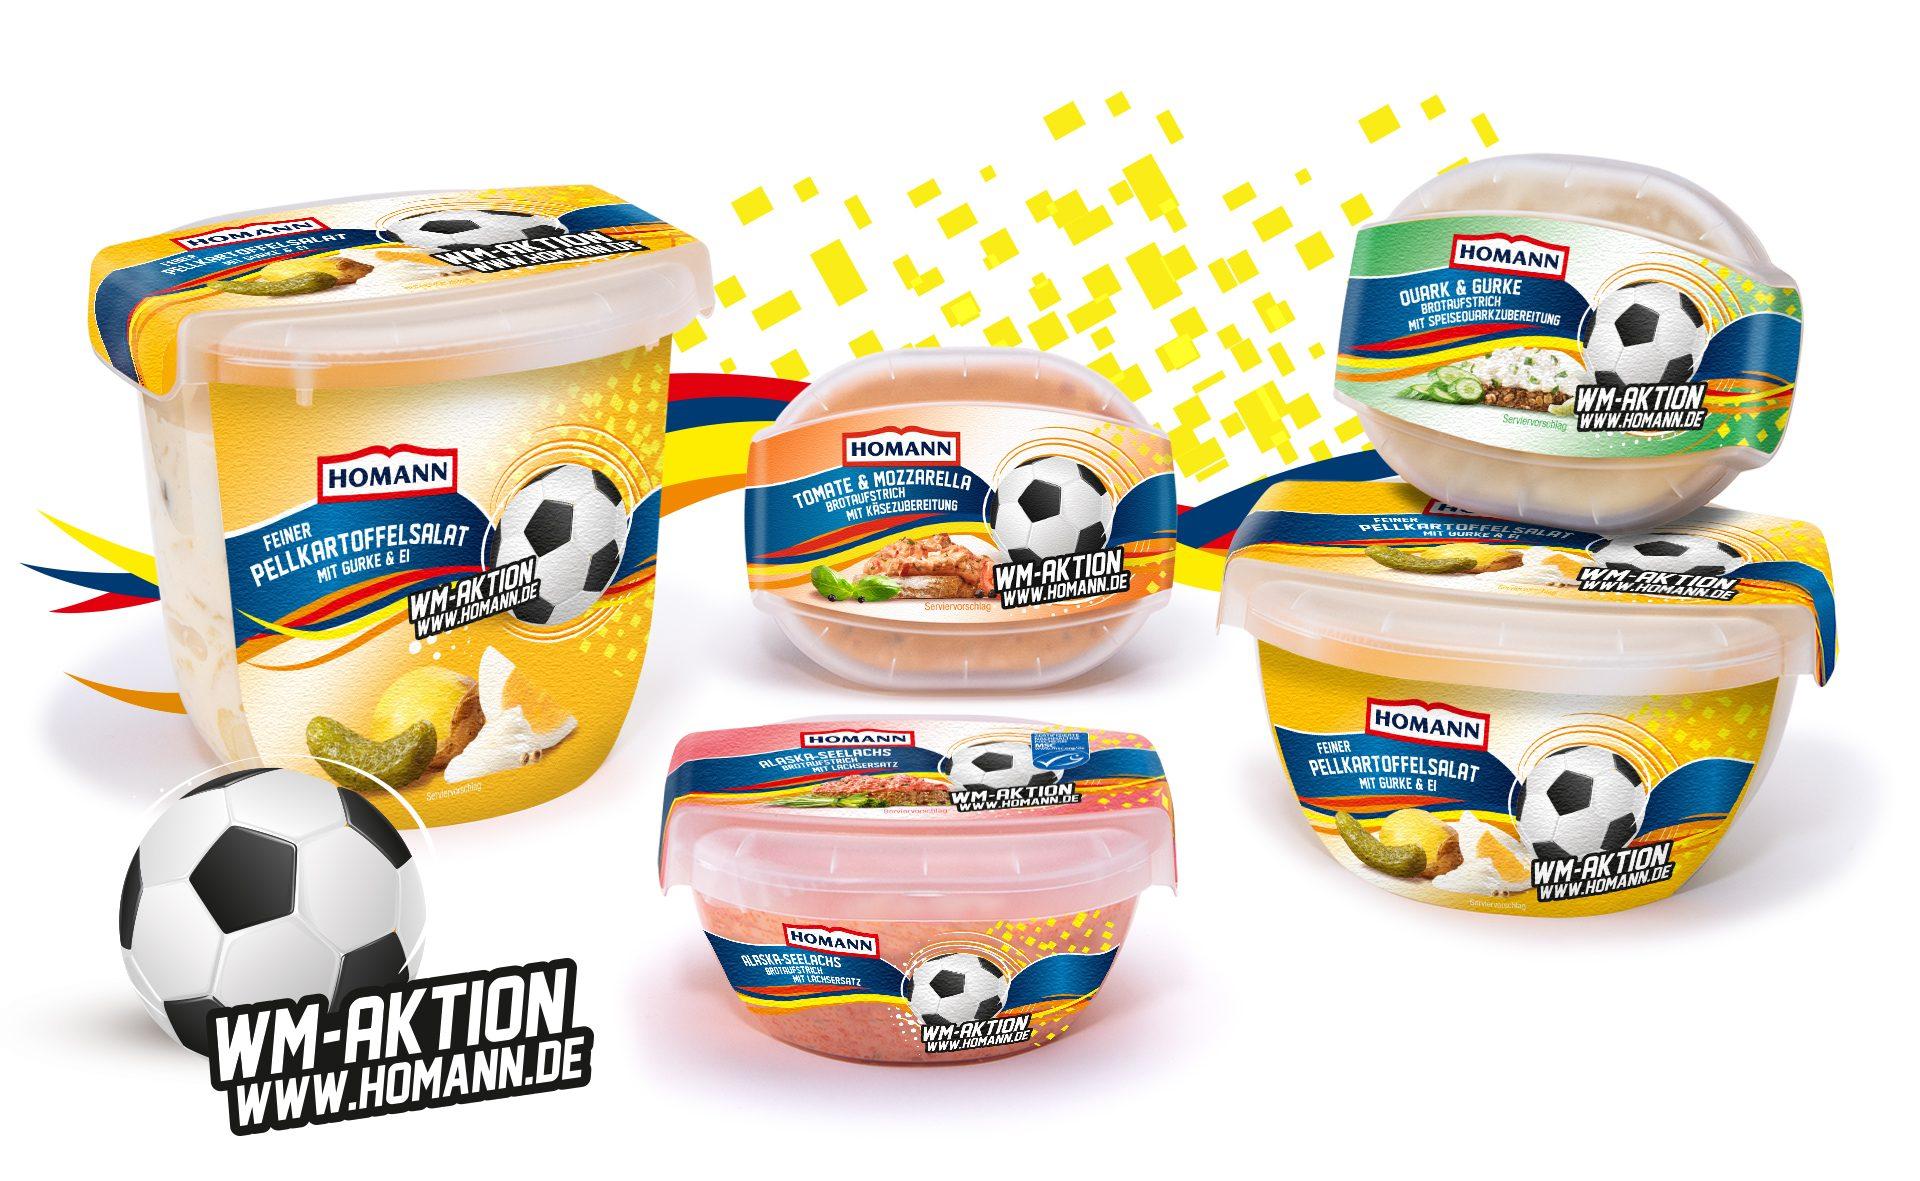 Verpackungsdesign Malvega: Homann WM Aktion